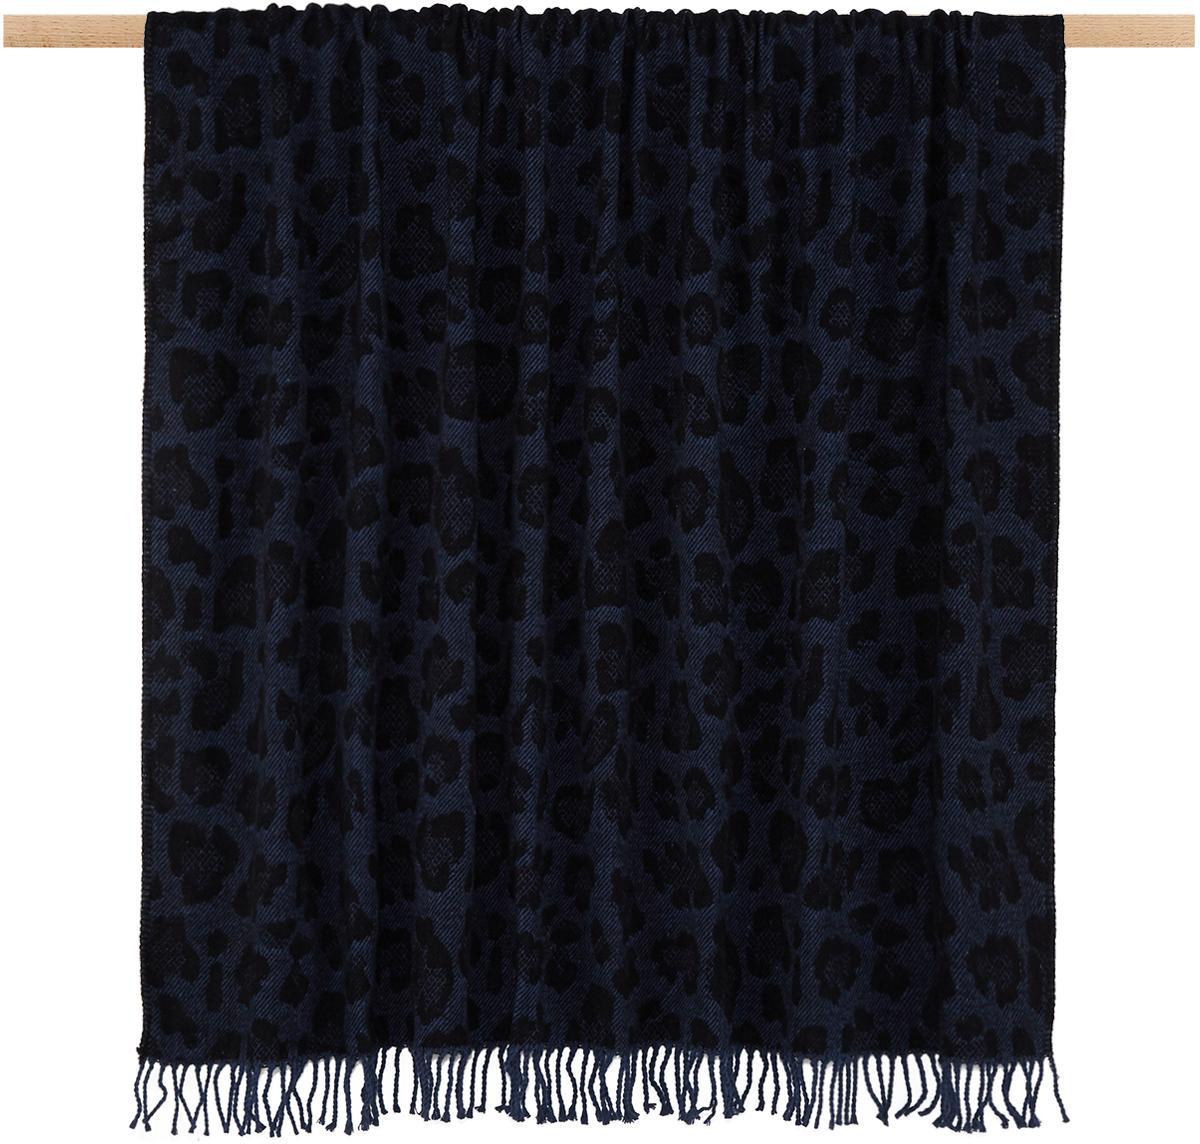 Plaid Bory met luipaarden print, 60%katoen, 40%acryl, Blauw, 150 x 200 cm